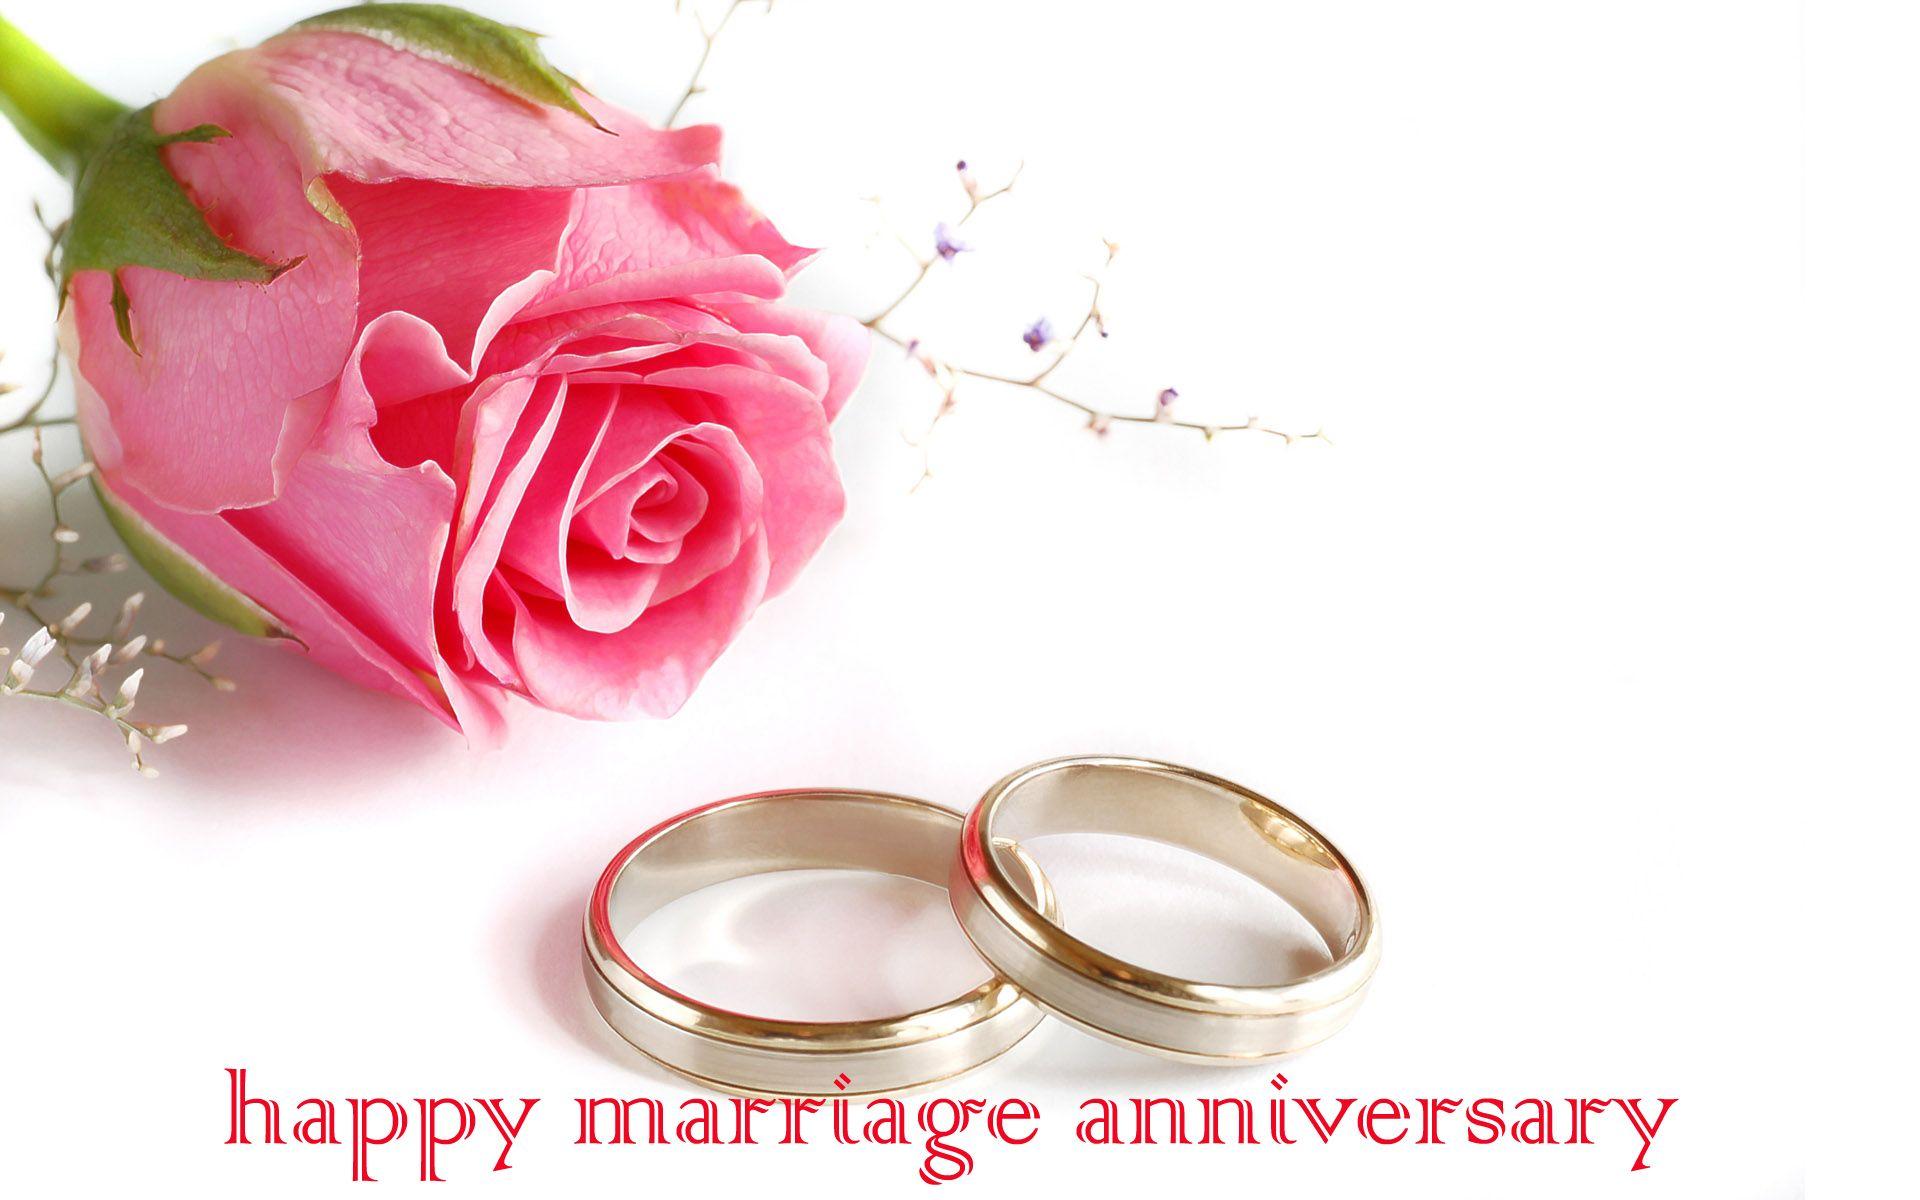 Marriage Anniversary Wedding Background Wallpaper Wedding